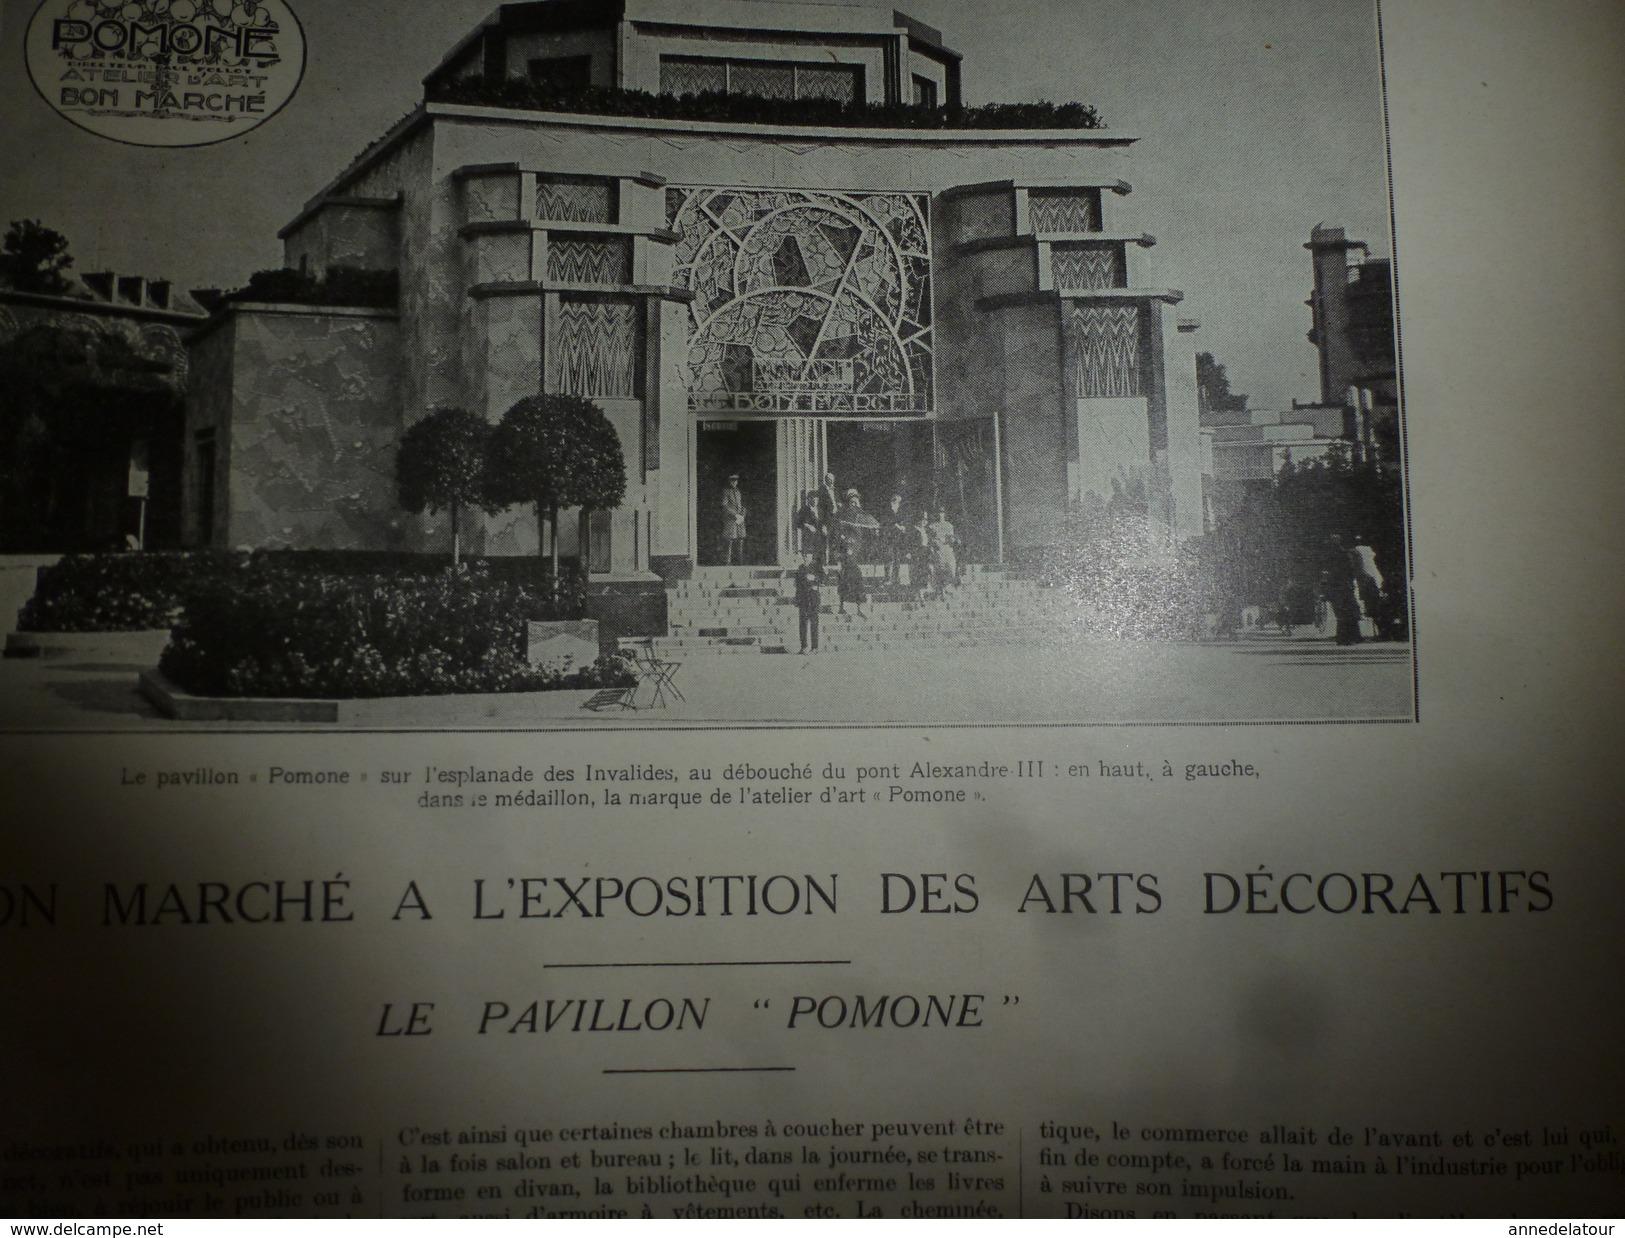 1925 L'ILLUSTRATION :  MAROC (Djebel Nador,Kifane,Djebel Selloum,Tizi-Ouzli,Syah,Meknès,etc); ARTS DÉCORATIFS (++++) - L'Illustration